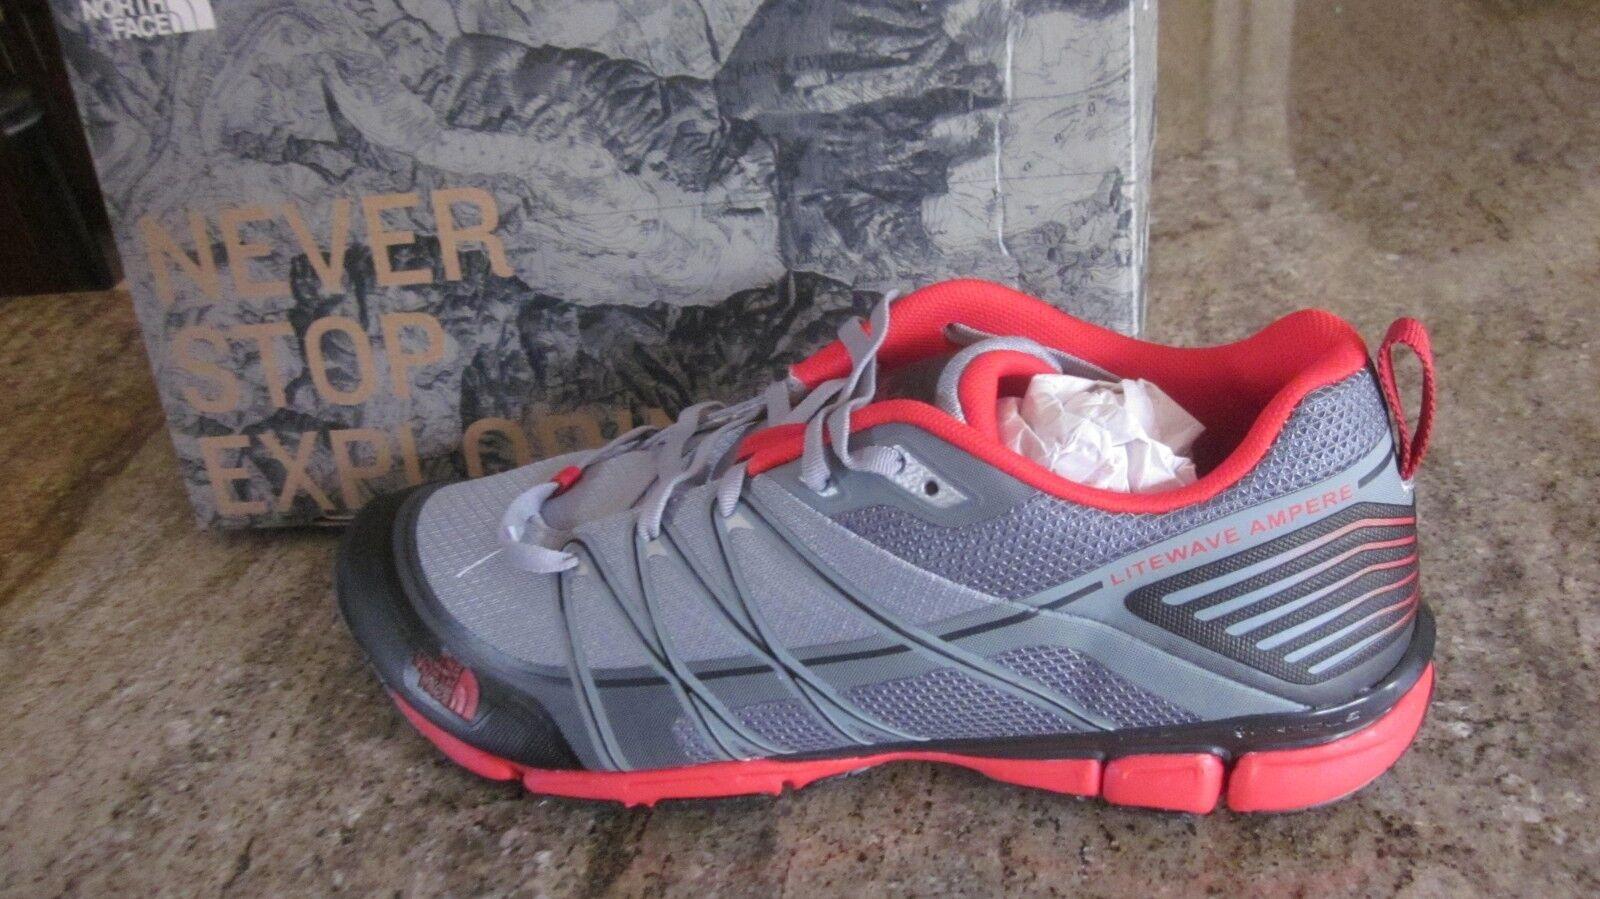 The North Face Men's Litewave Ampere Trainer shoes SZ 8.5